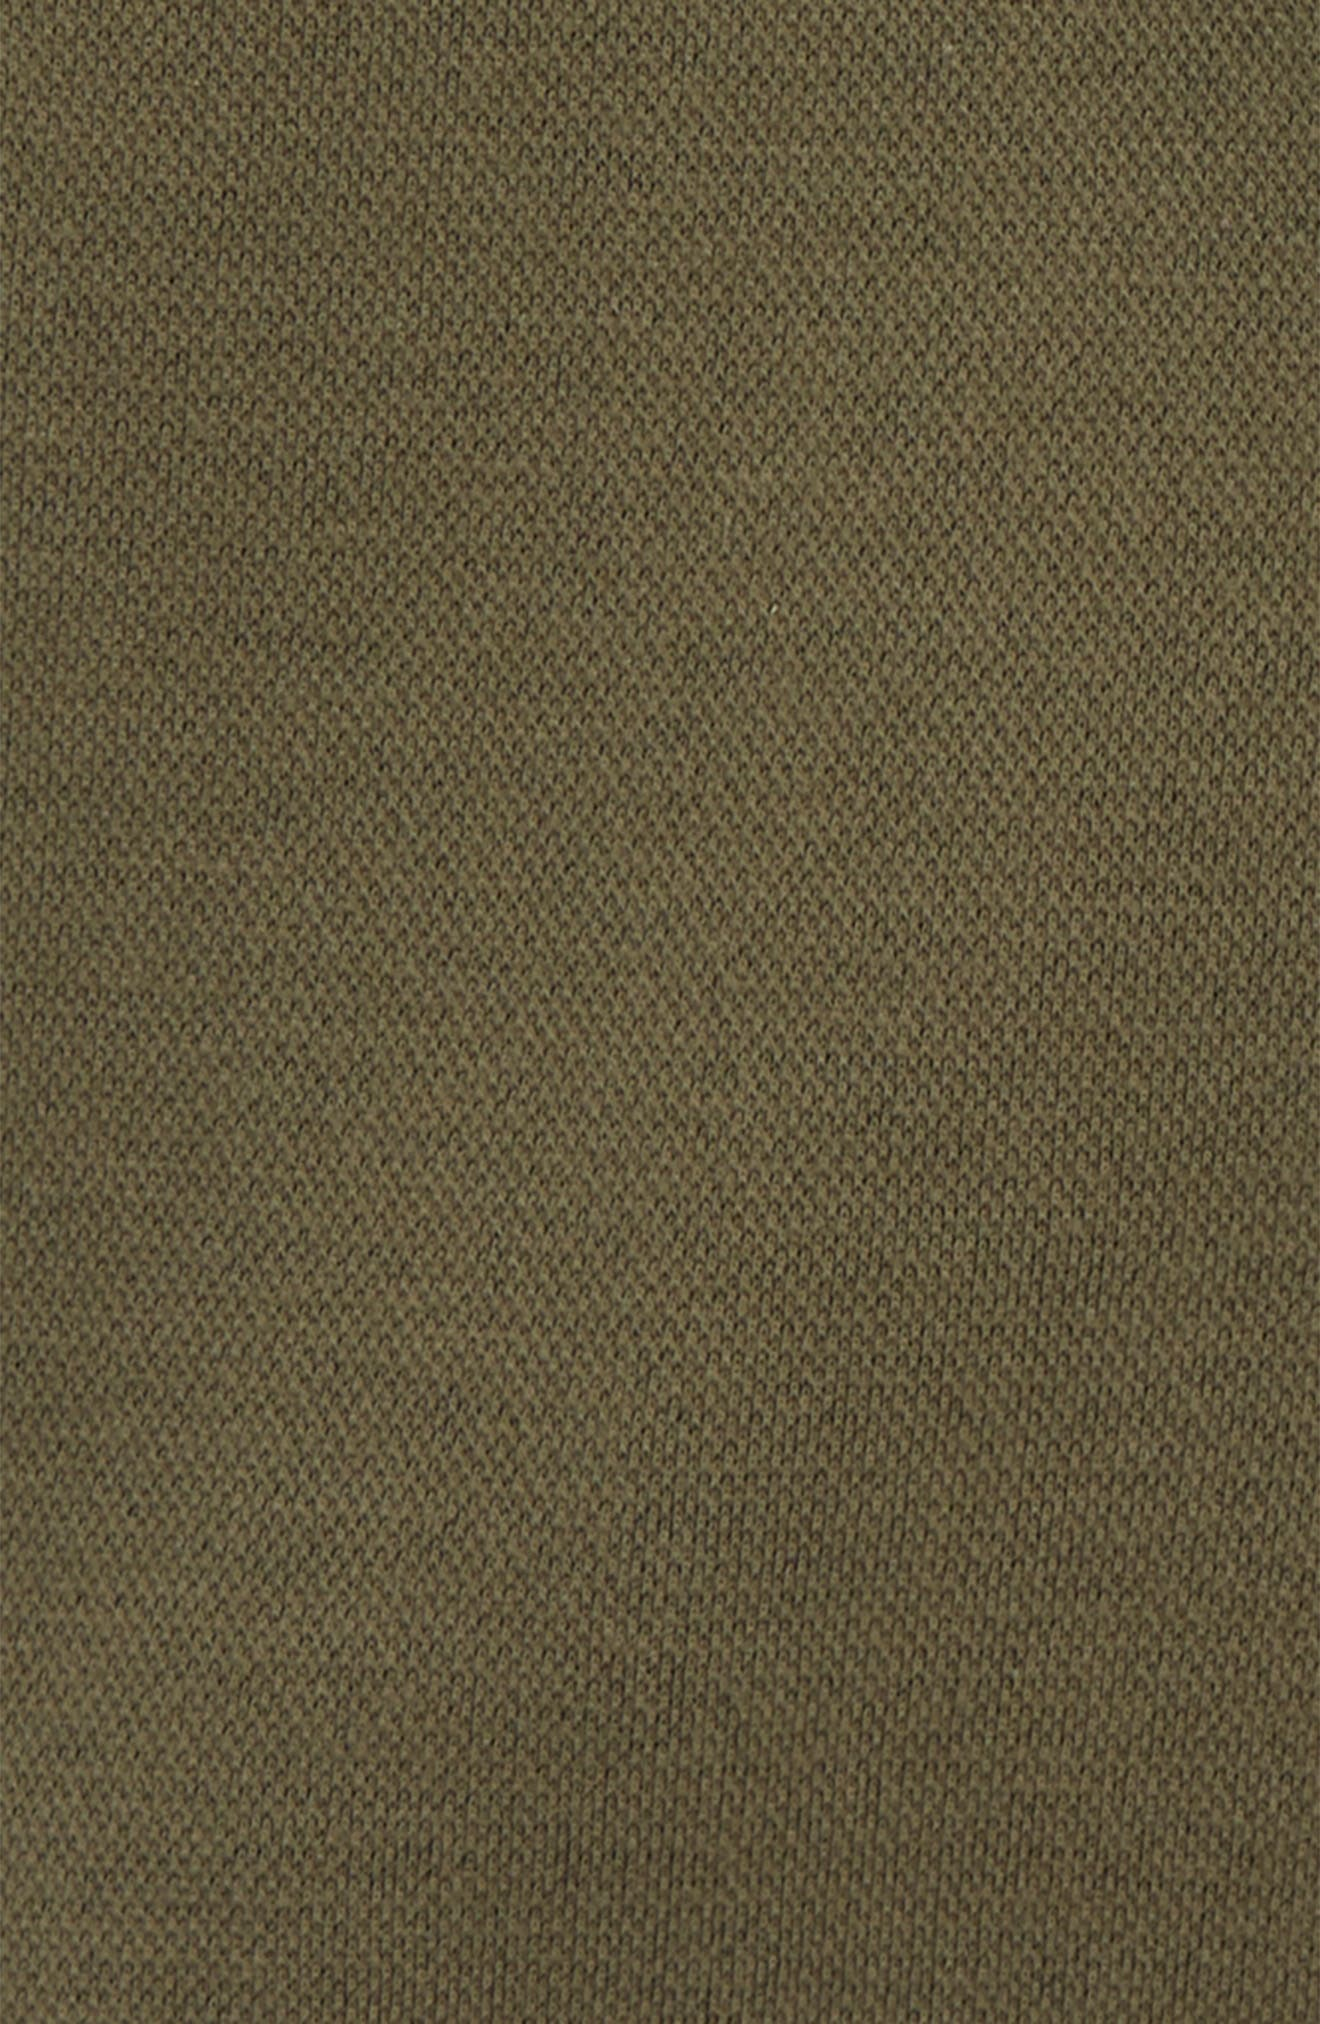 Jersey Chino Shorts,                             Alternate thumbnail 3, color,                             304